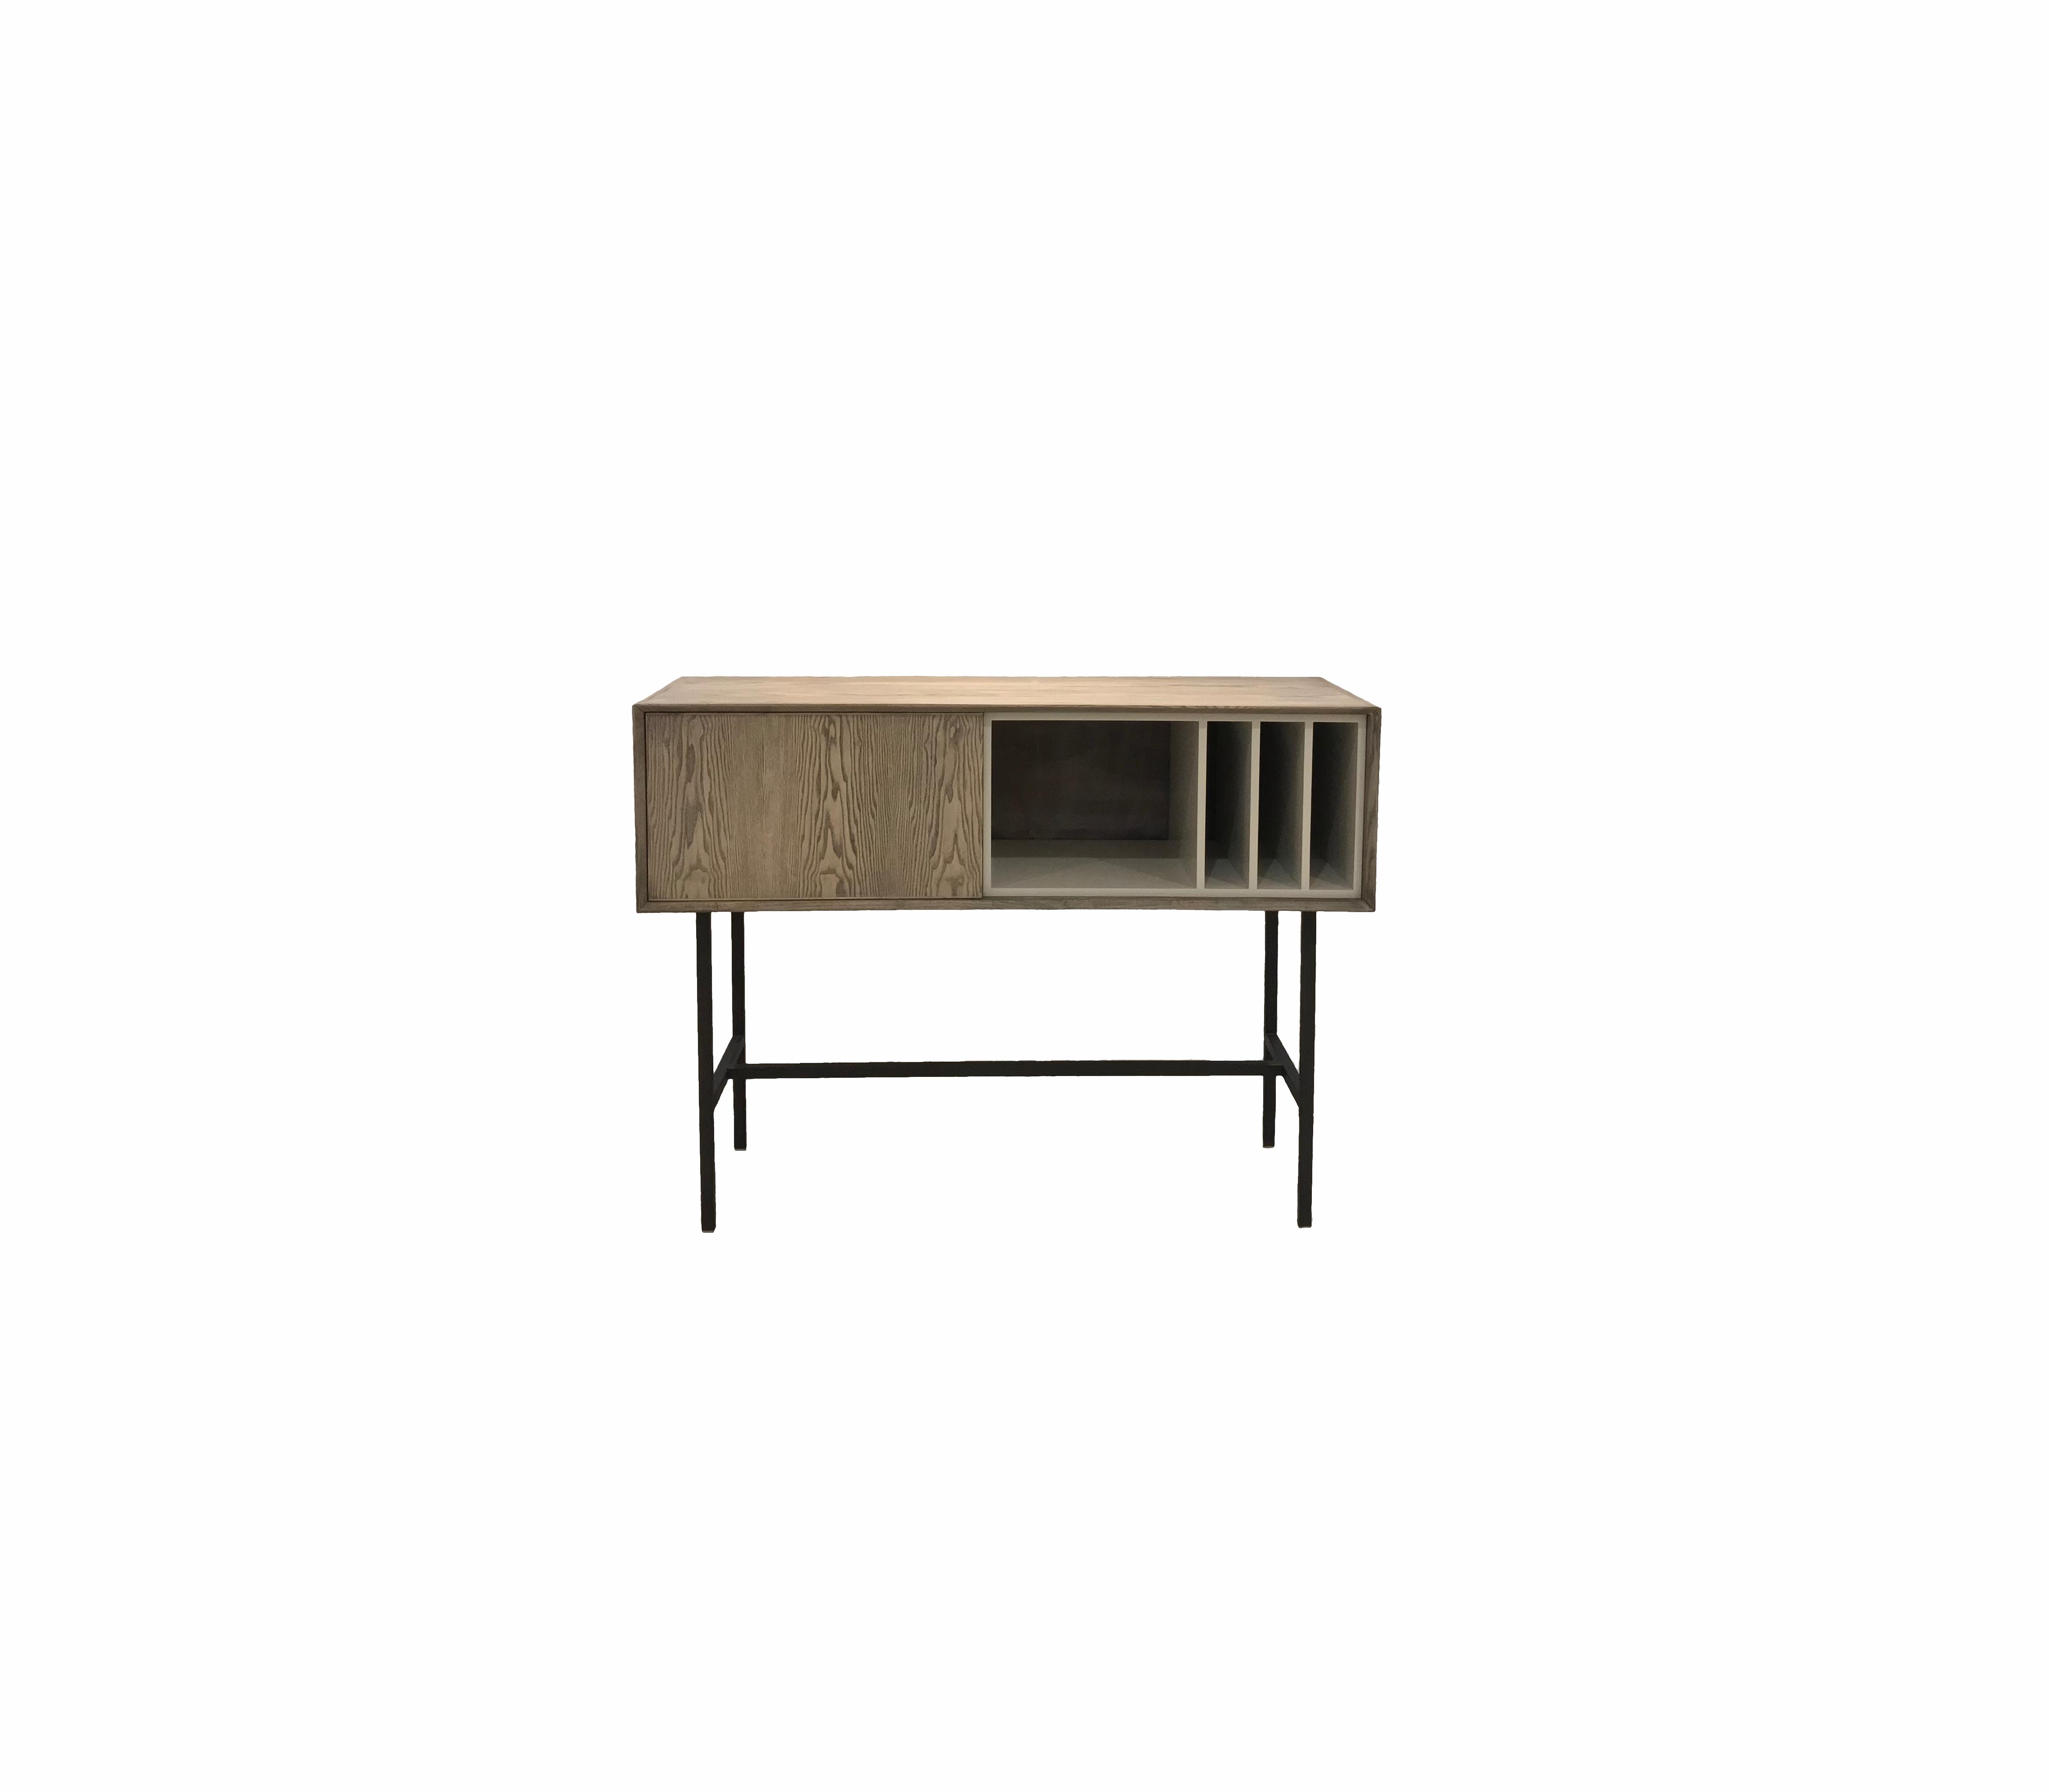 Stark storage/drinks cabinet